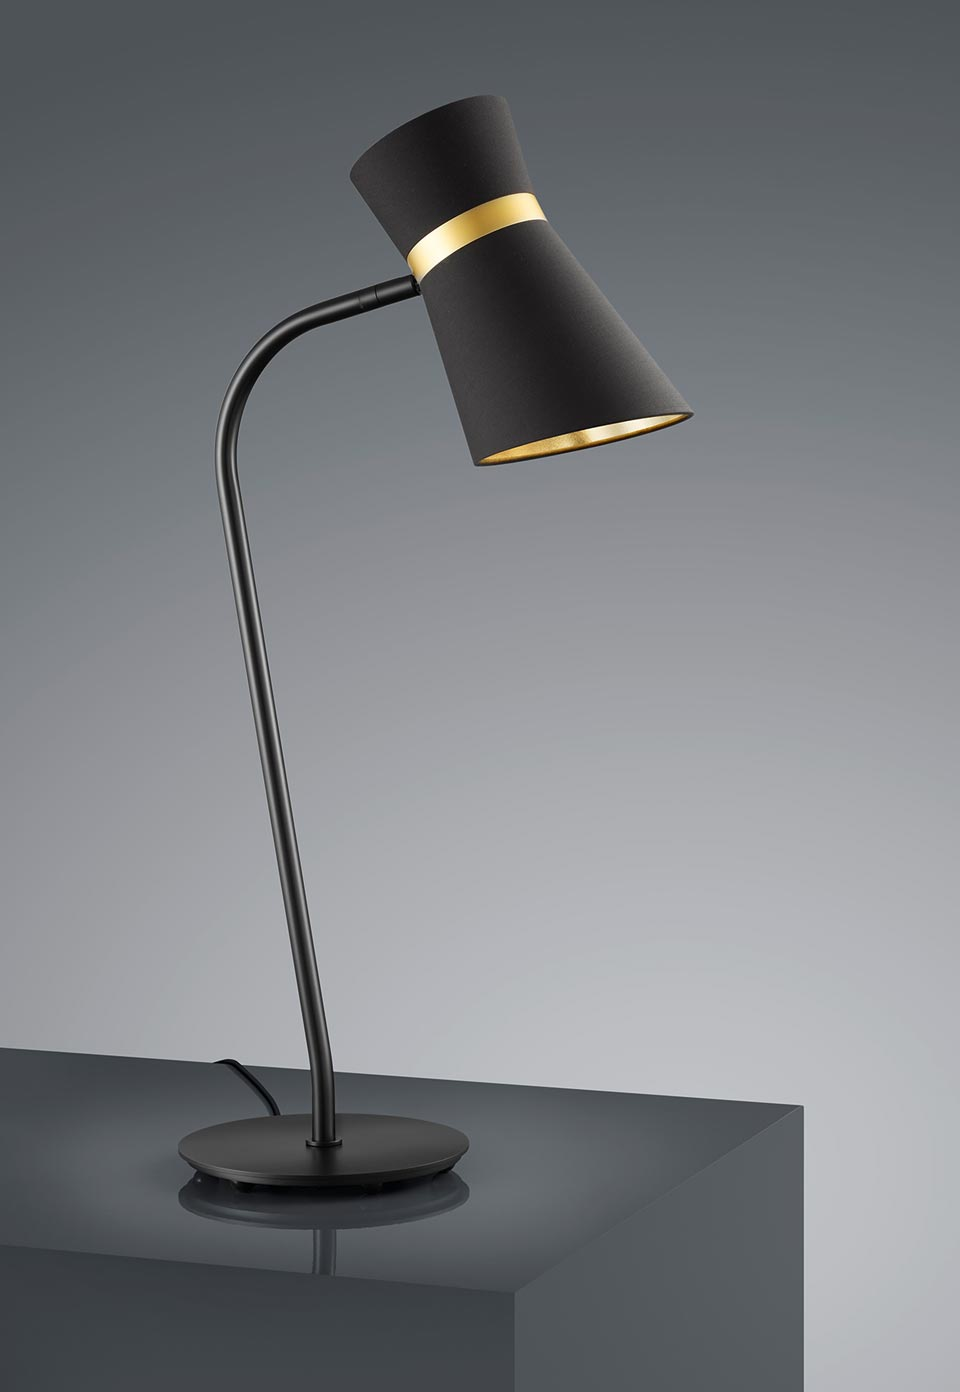 Pied Métal Avec Lampe Noir Mat En 0n8PwkO